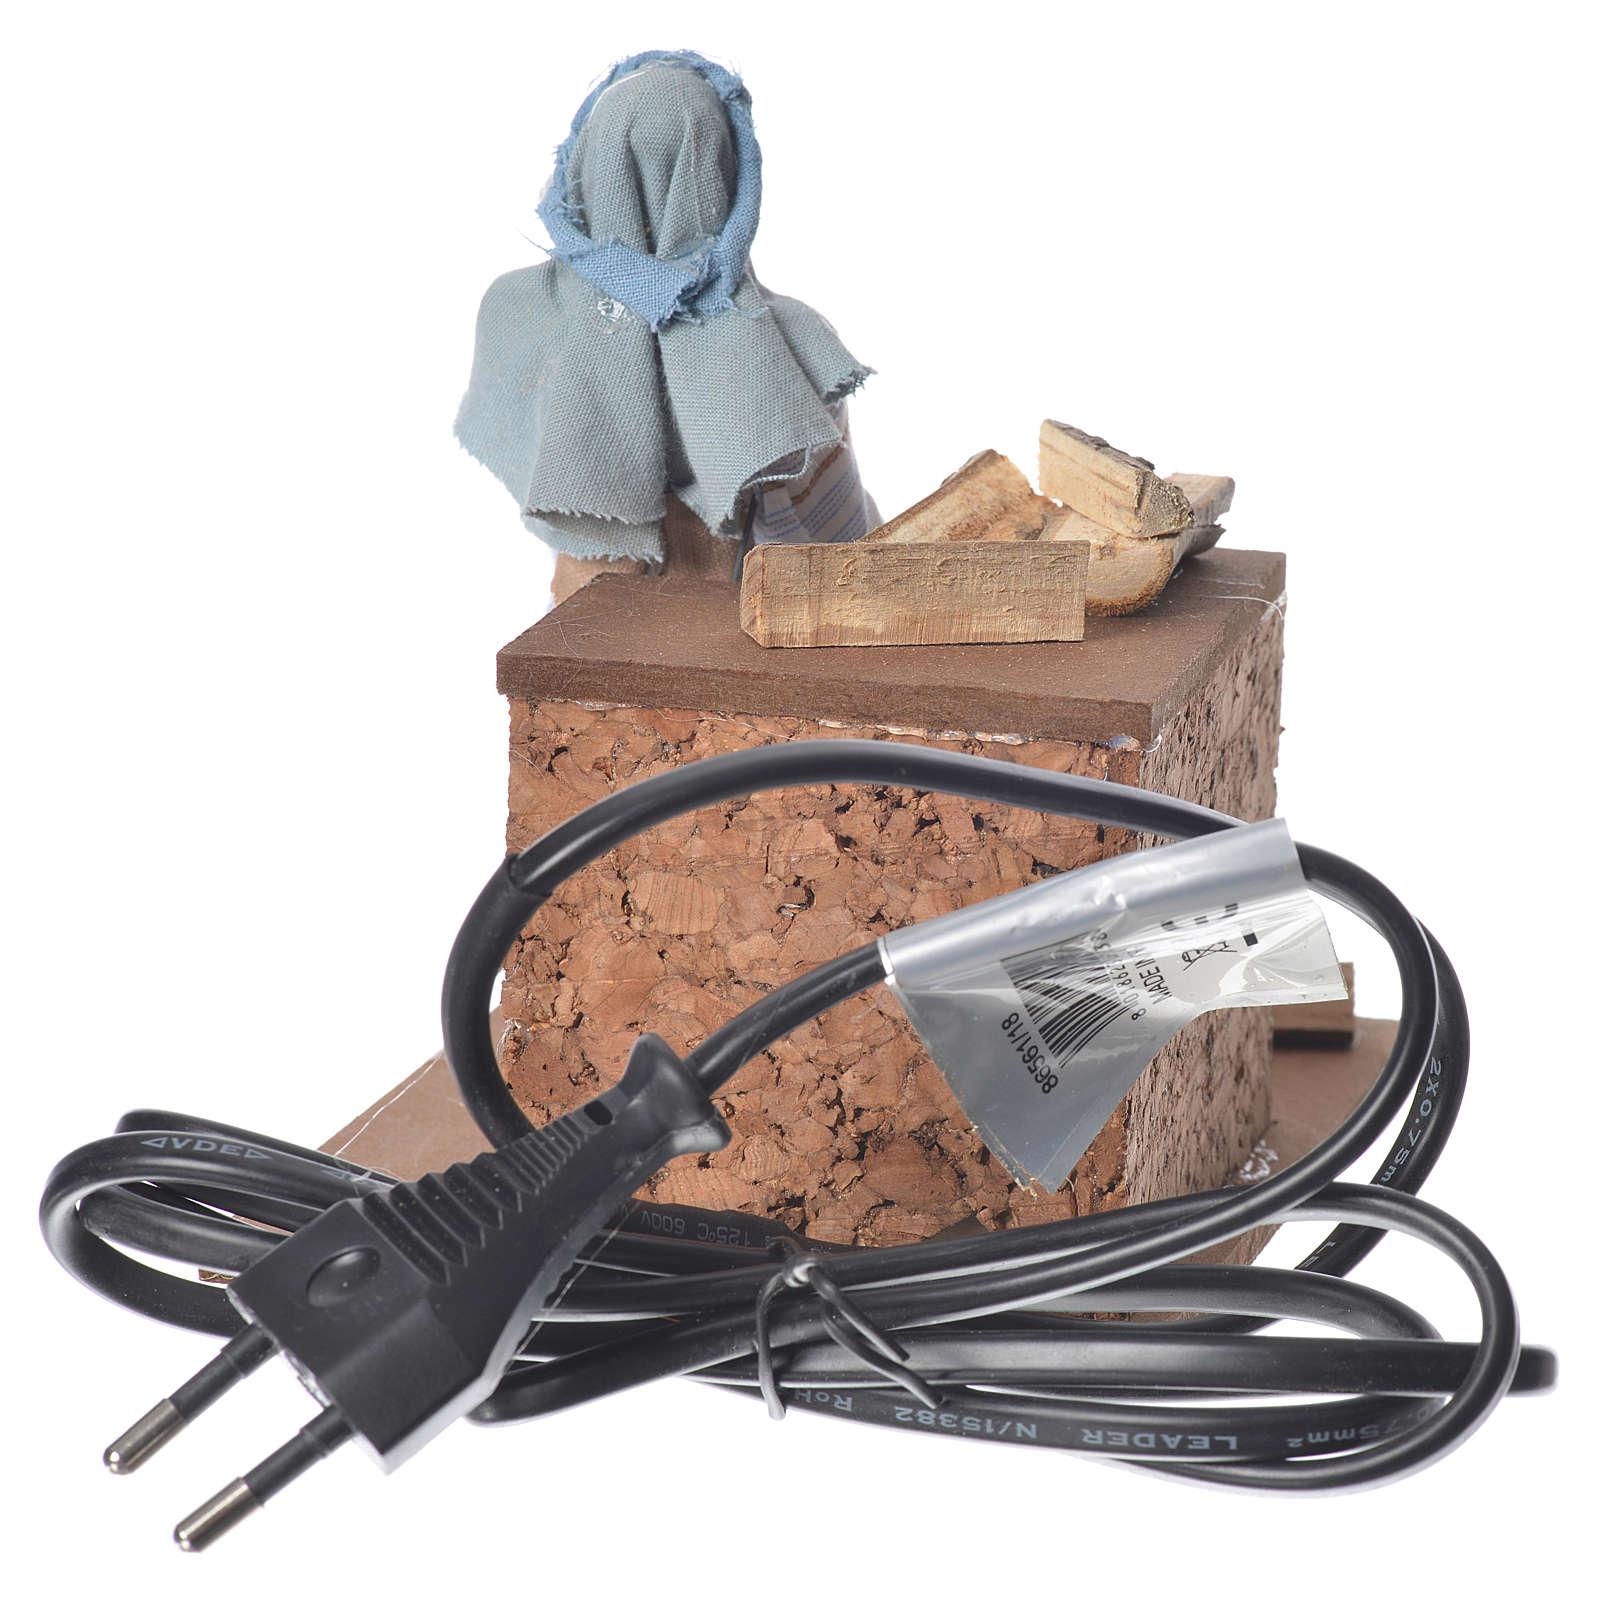 Arabian woodcutter, animated nativity figurine 12cm 3